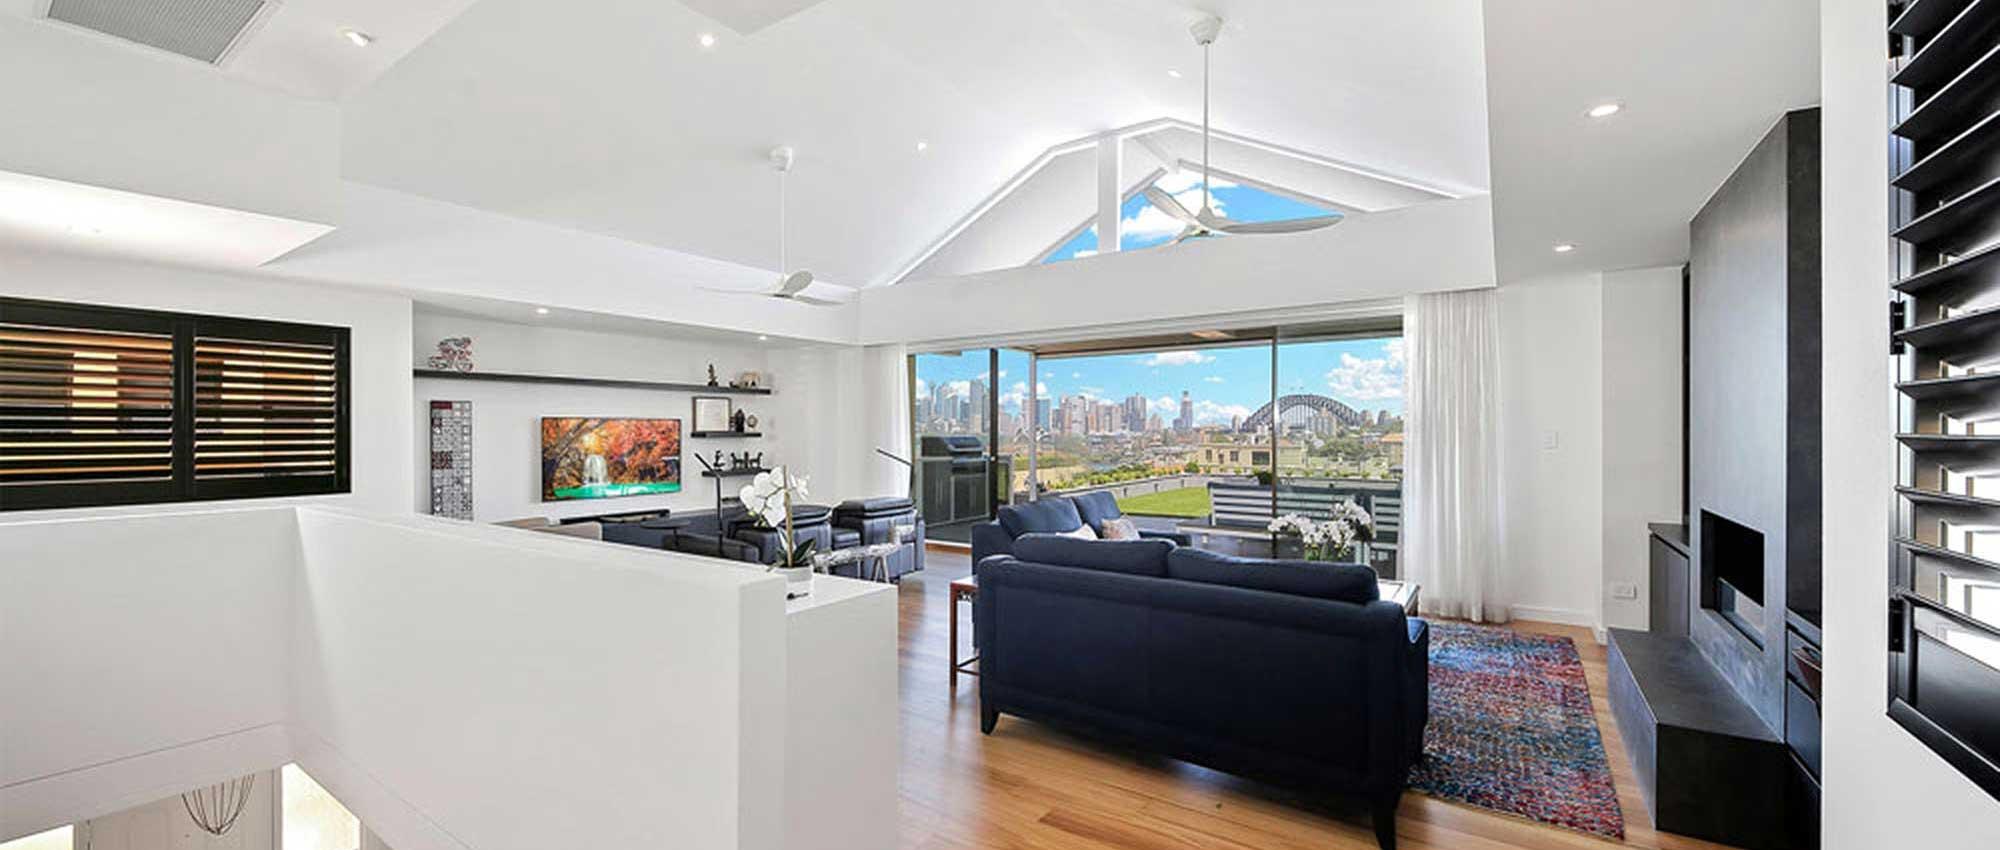 Bumph and Scumble Interior Design Sydney